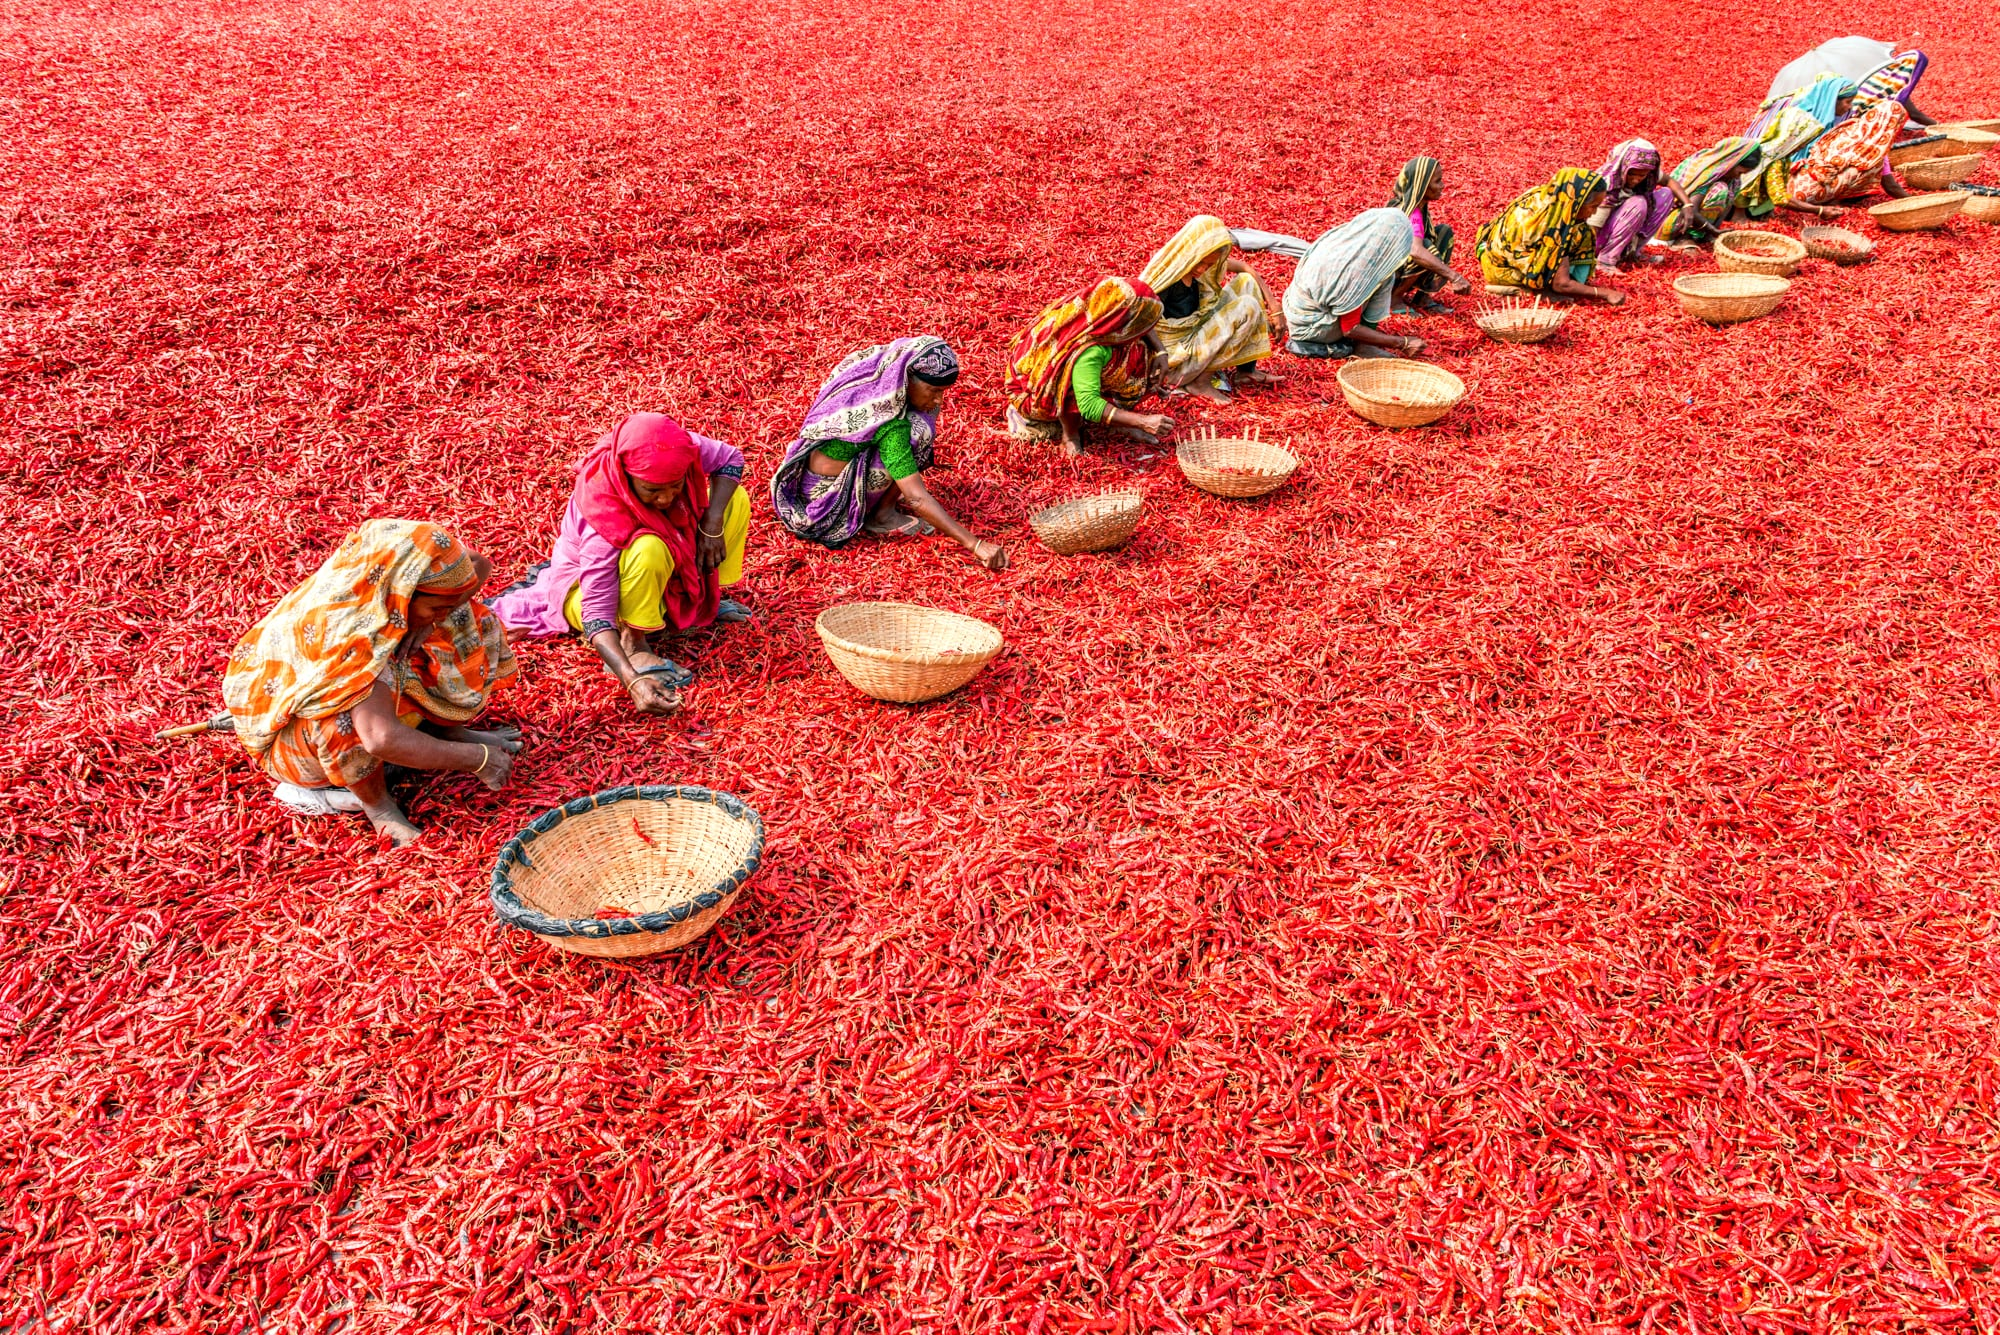 Bangladesh Women Climate Change Chili Peppers